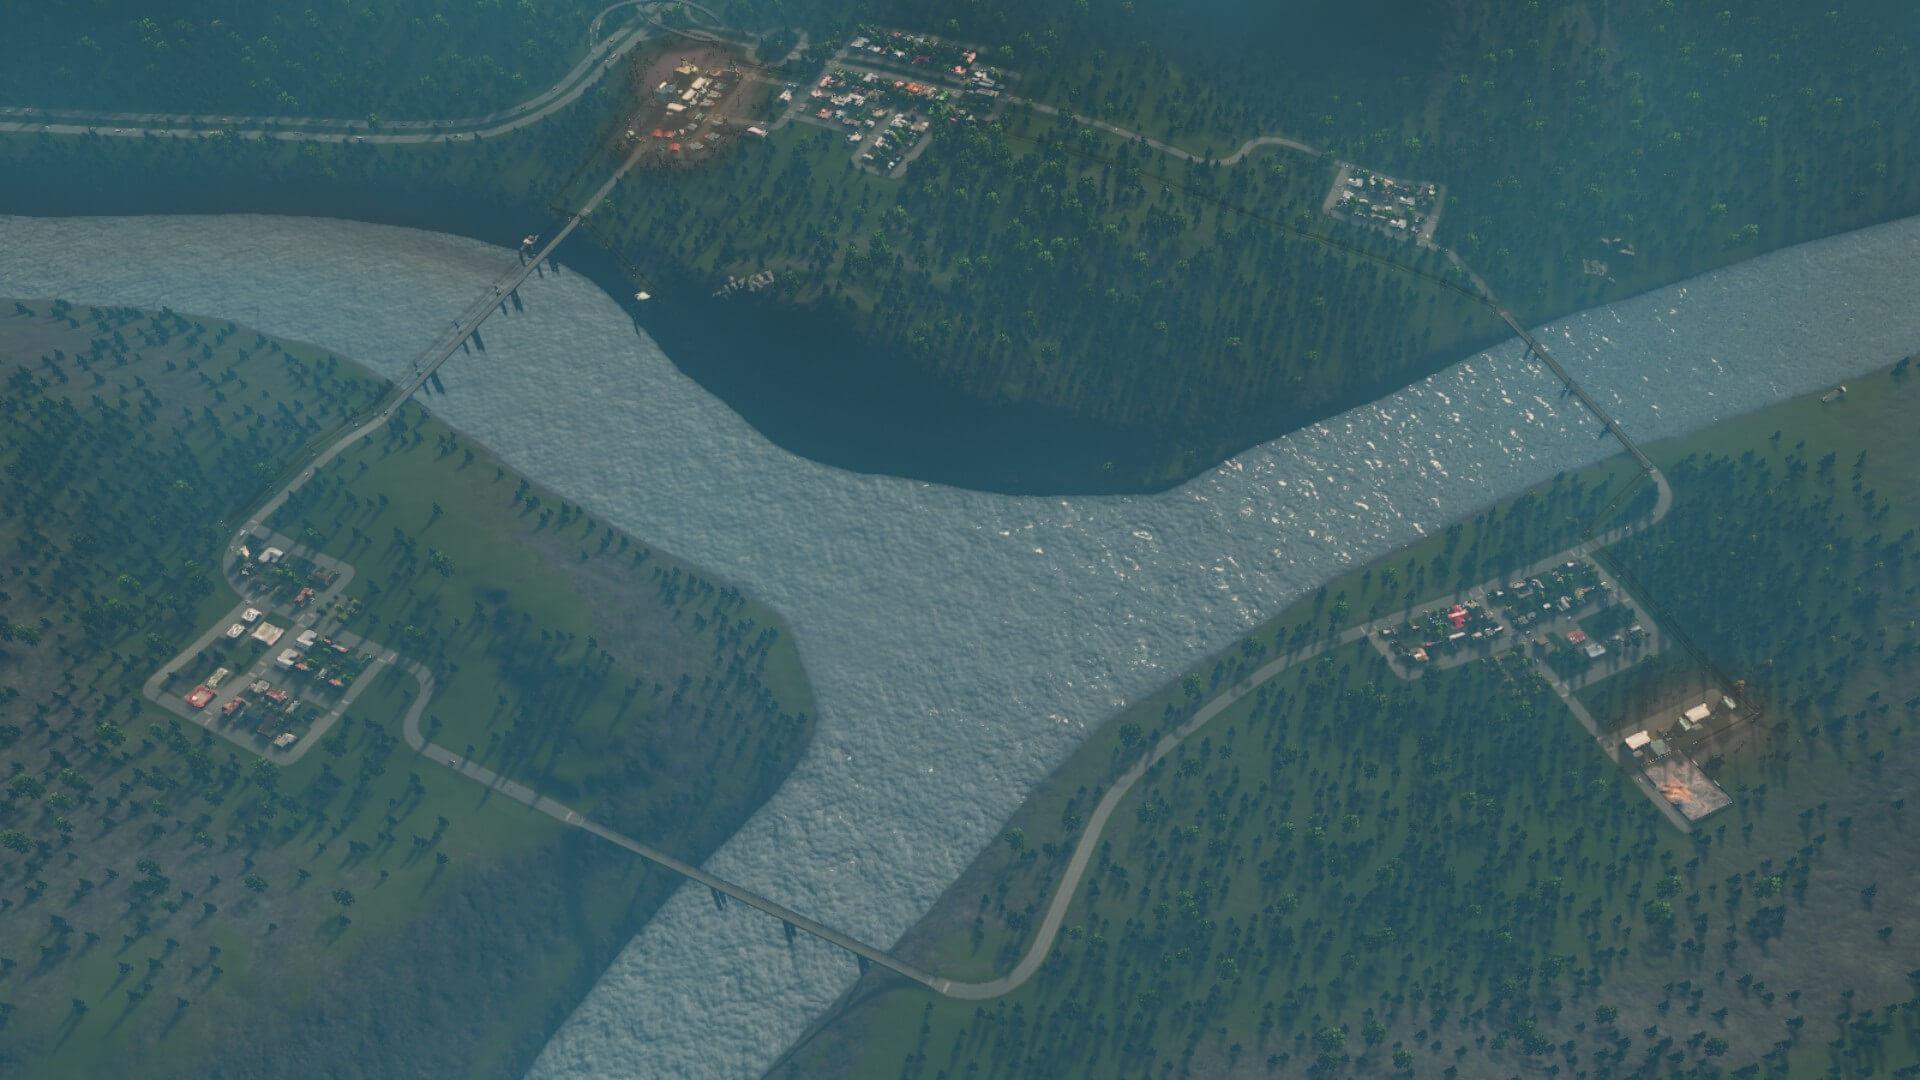 Salzburg 【Cities:skylines 攻略ブログ】シナリオ アルパイン・ヴィレッジ 公共の交通機関で50万人を輸送する Cities:Skylines(シティーズ:スカイライン ) 街作りシミュレーションゲーム